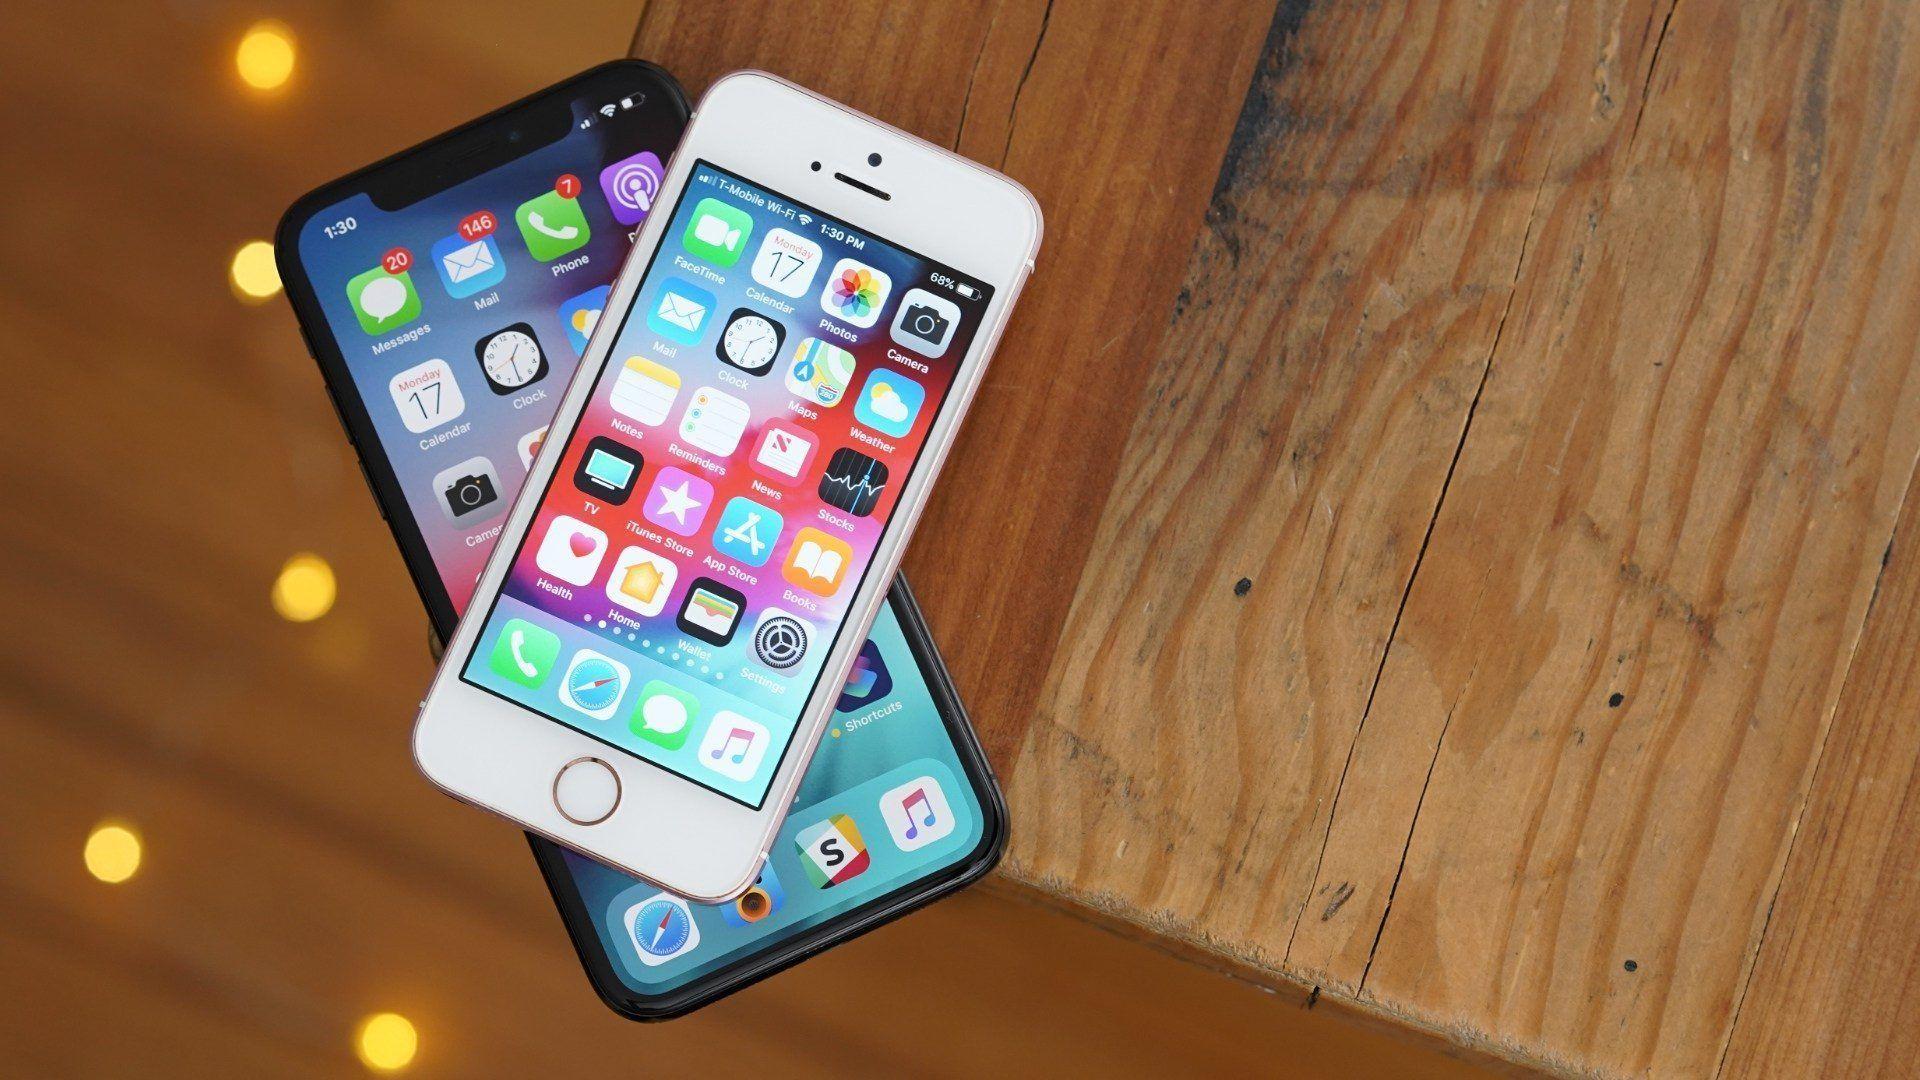 Apple Releasing Ios 12 4 1 Likely Includes Jailbreak Vulnerability Fixhttps 9to5mac Com 2019 08 26 Ios 12 4 1 Jailbreak Iphone Ios App Development Iphone 4s